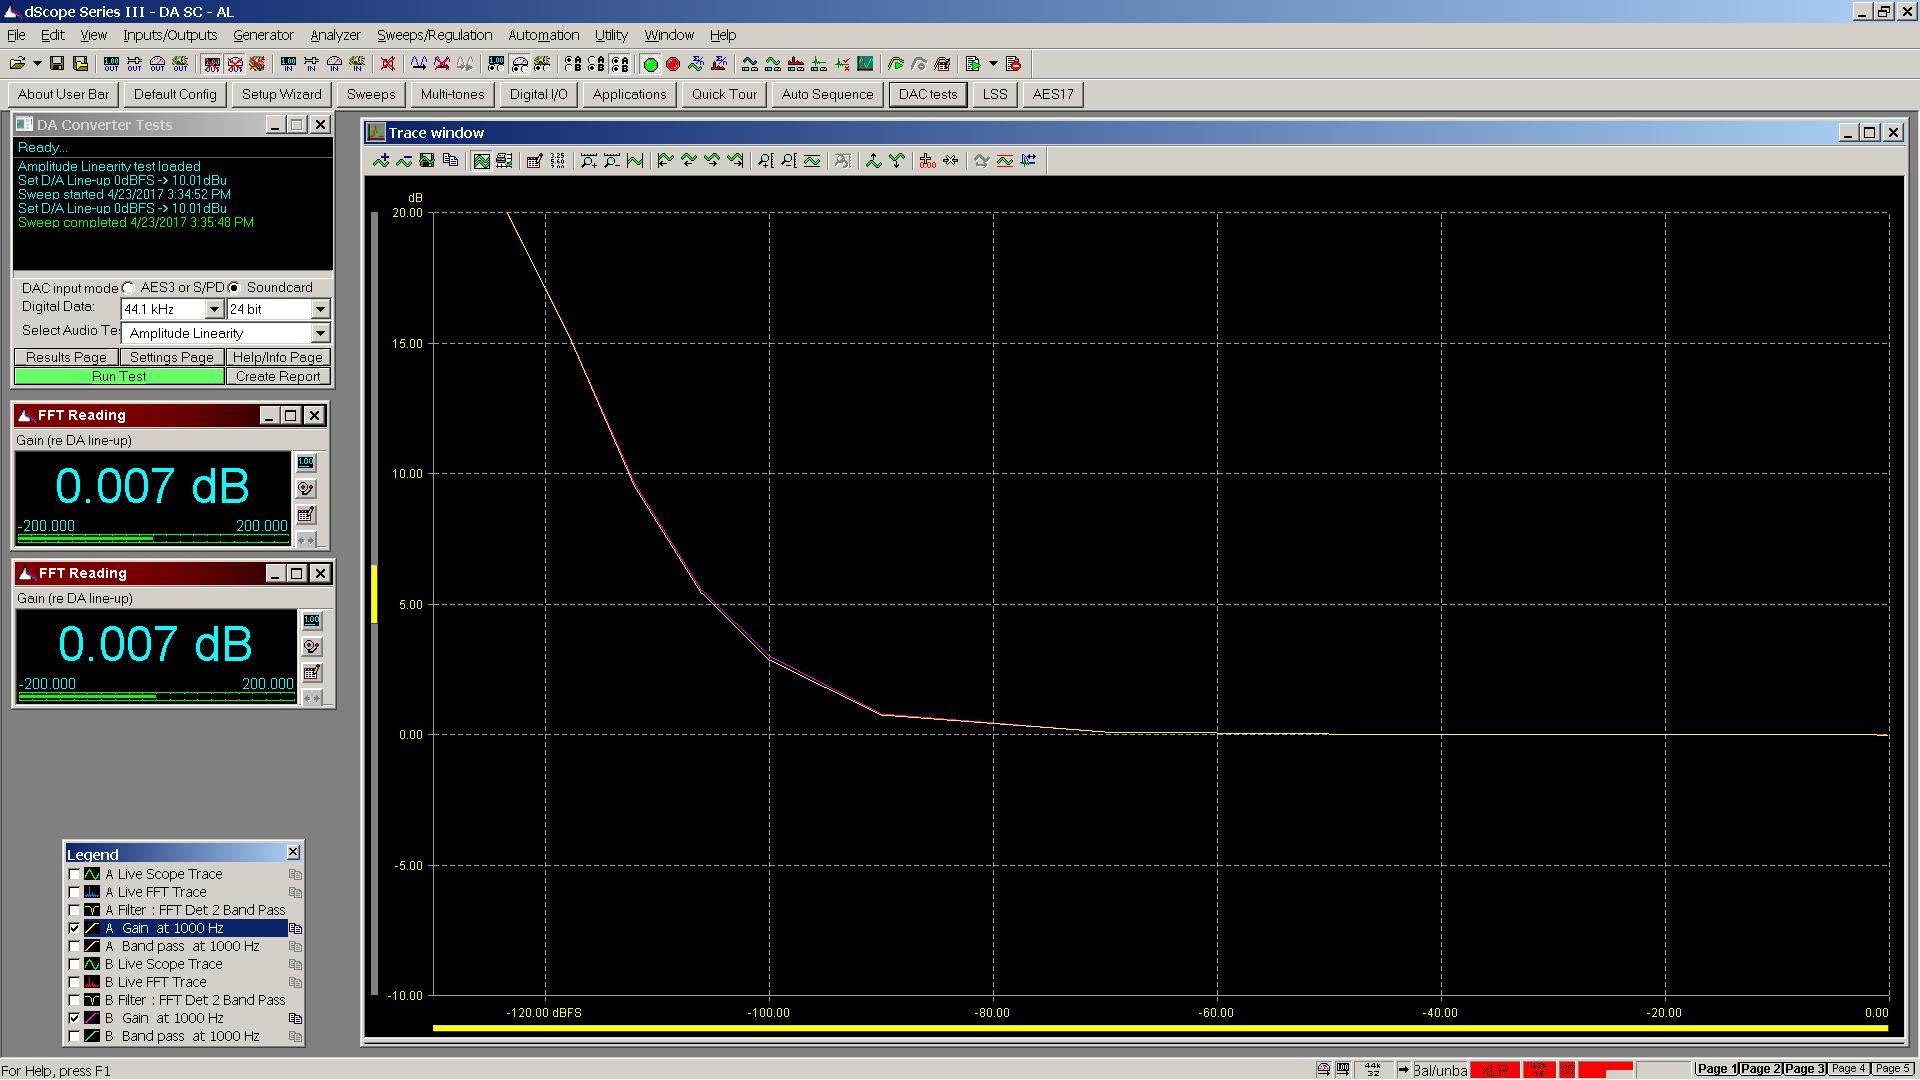 20170423 Audio-gd S19 SE 1KHz gain linearity - USB.PNG